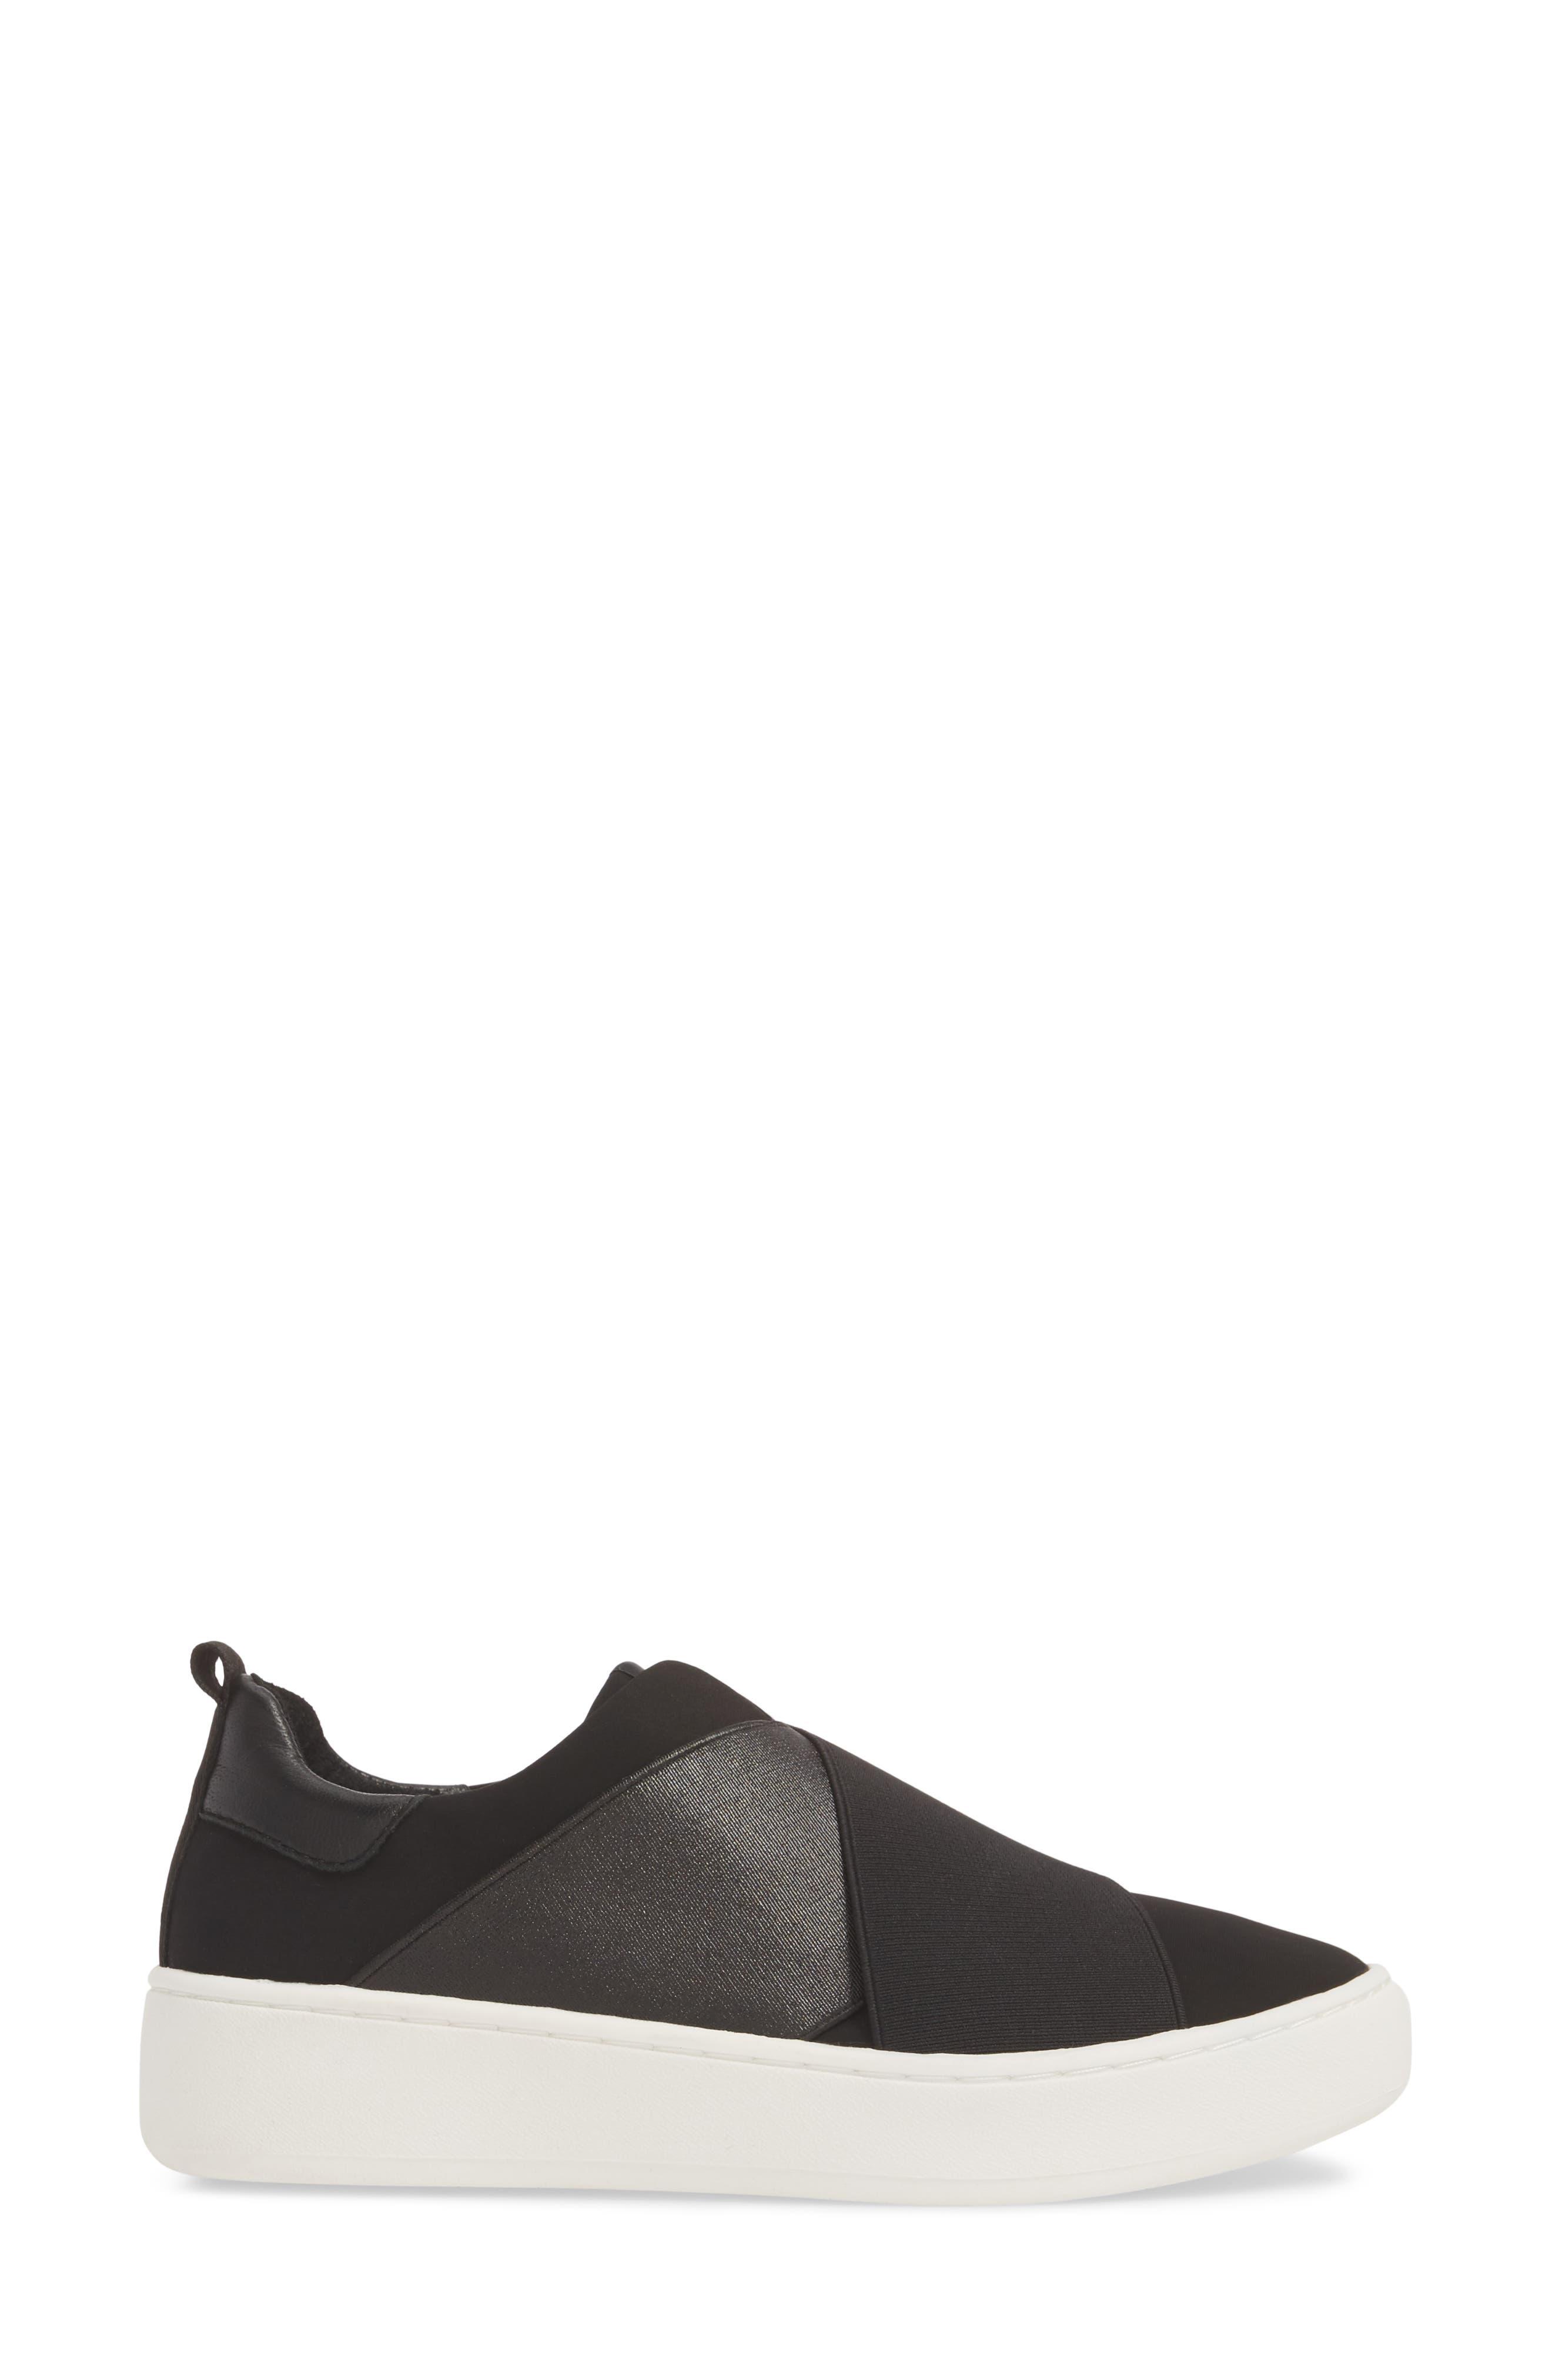 Coley Platform Slip-On Sneaker,                             Alternate thumbnail 3, color,                             BLACK LEATHER